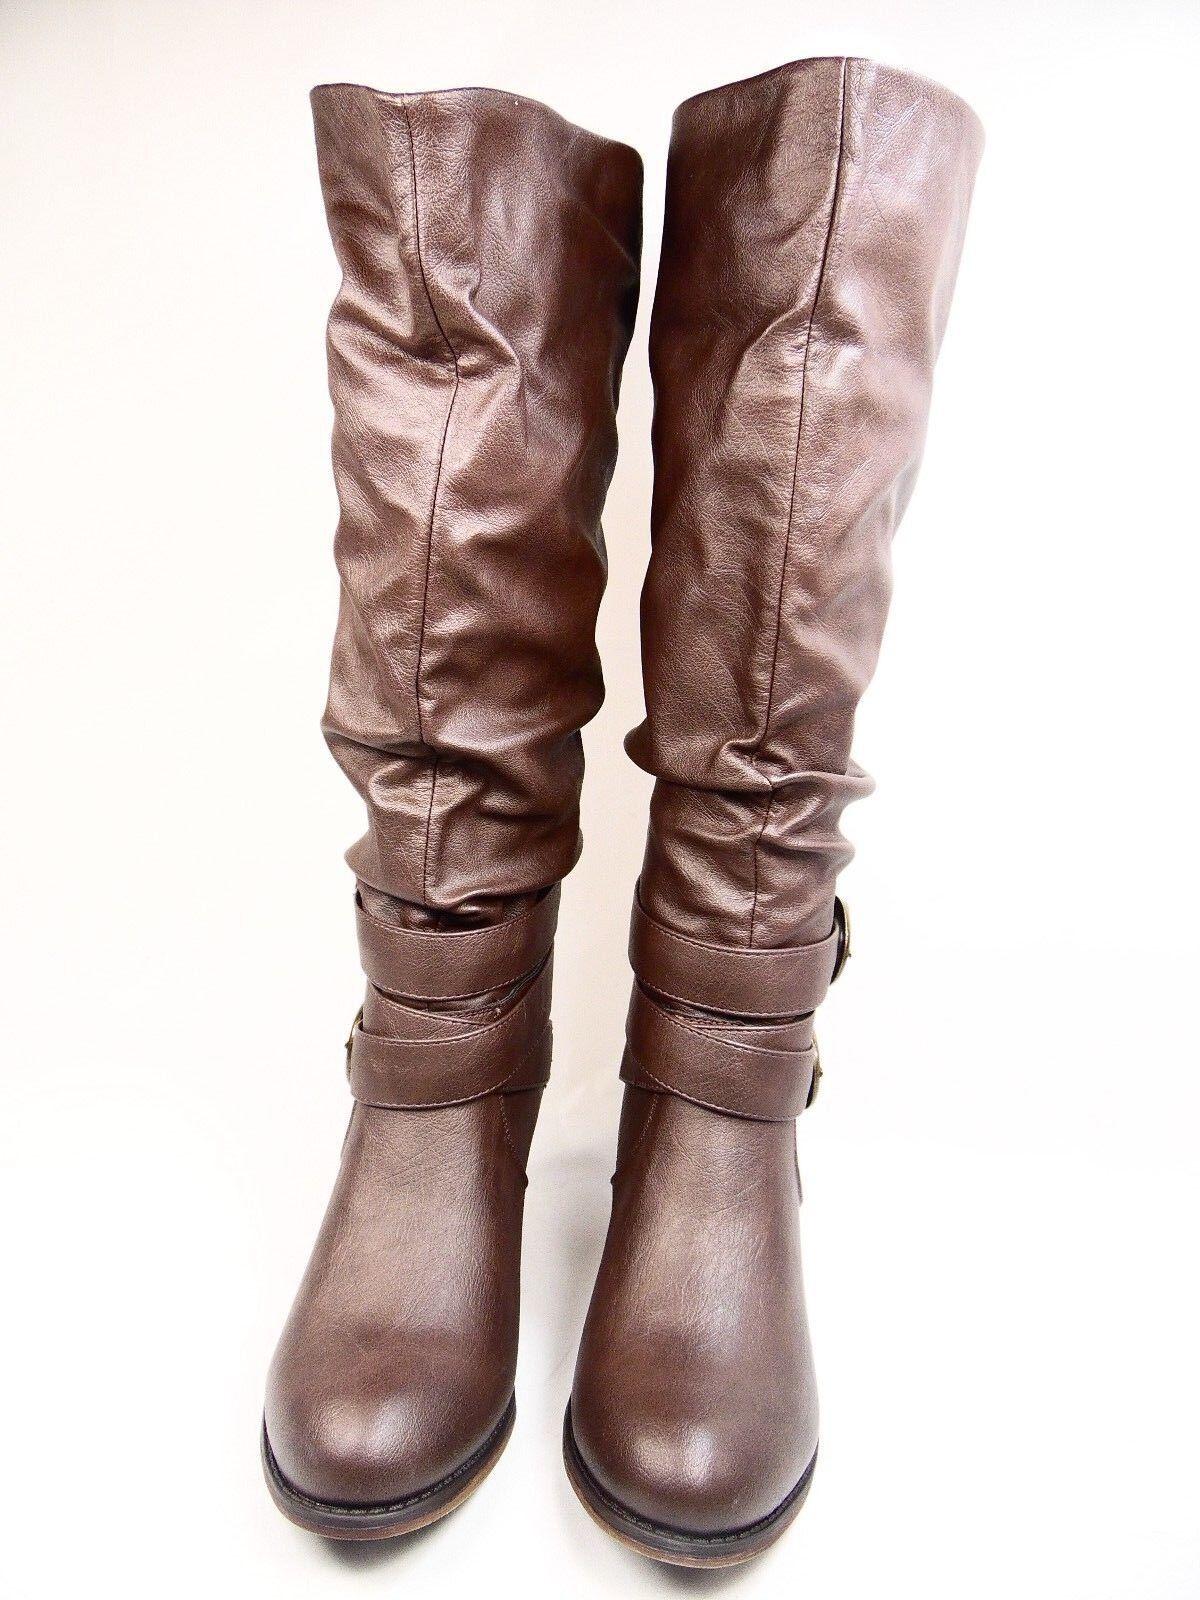 Journee Collection Late Wide Dark Calf Women Round Toe Dark Wide Brown Size 7 459e88